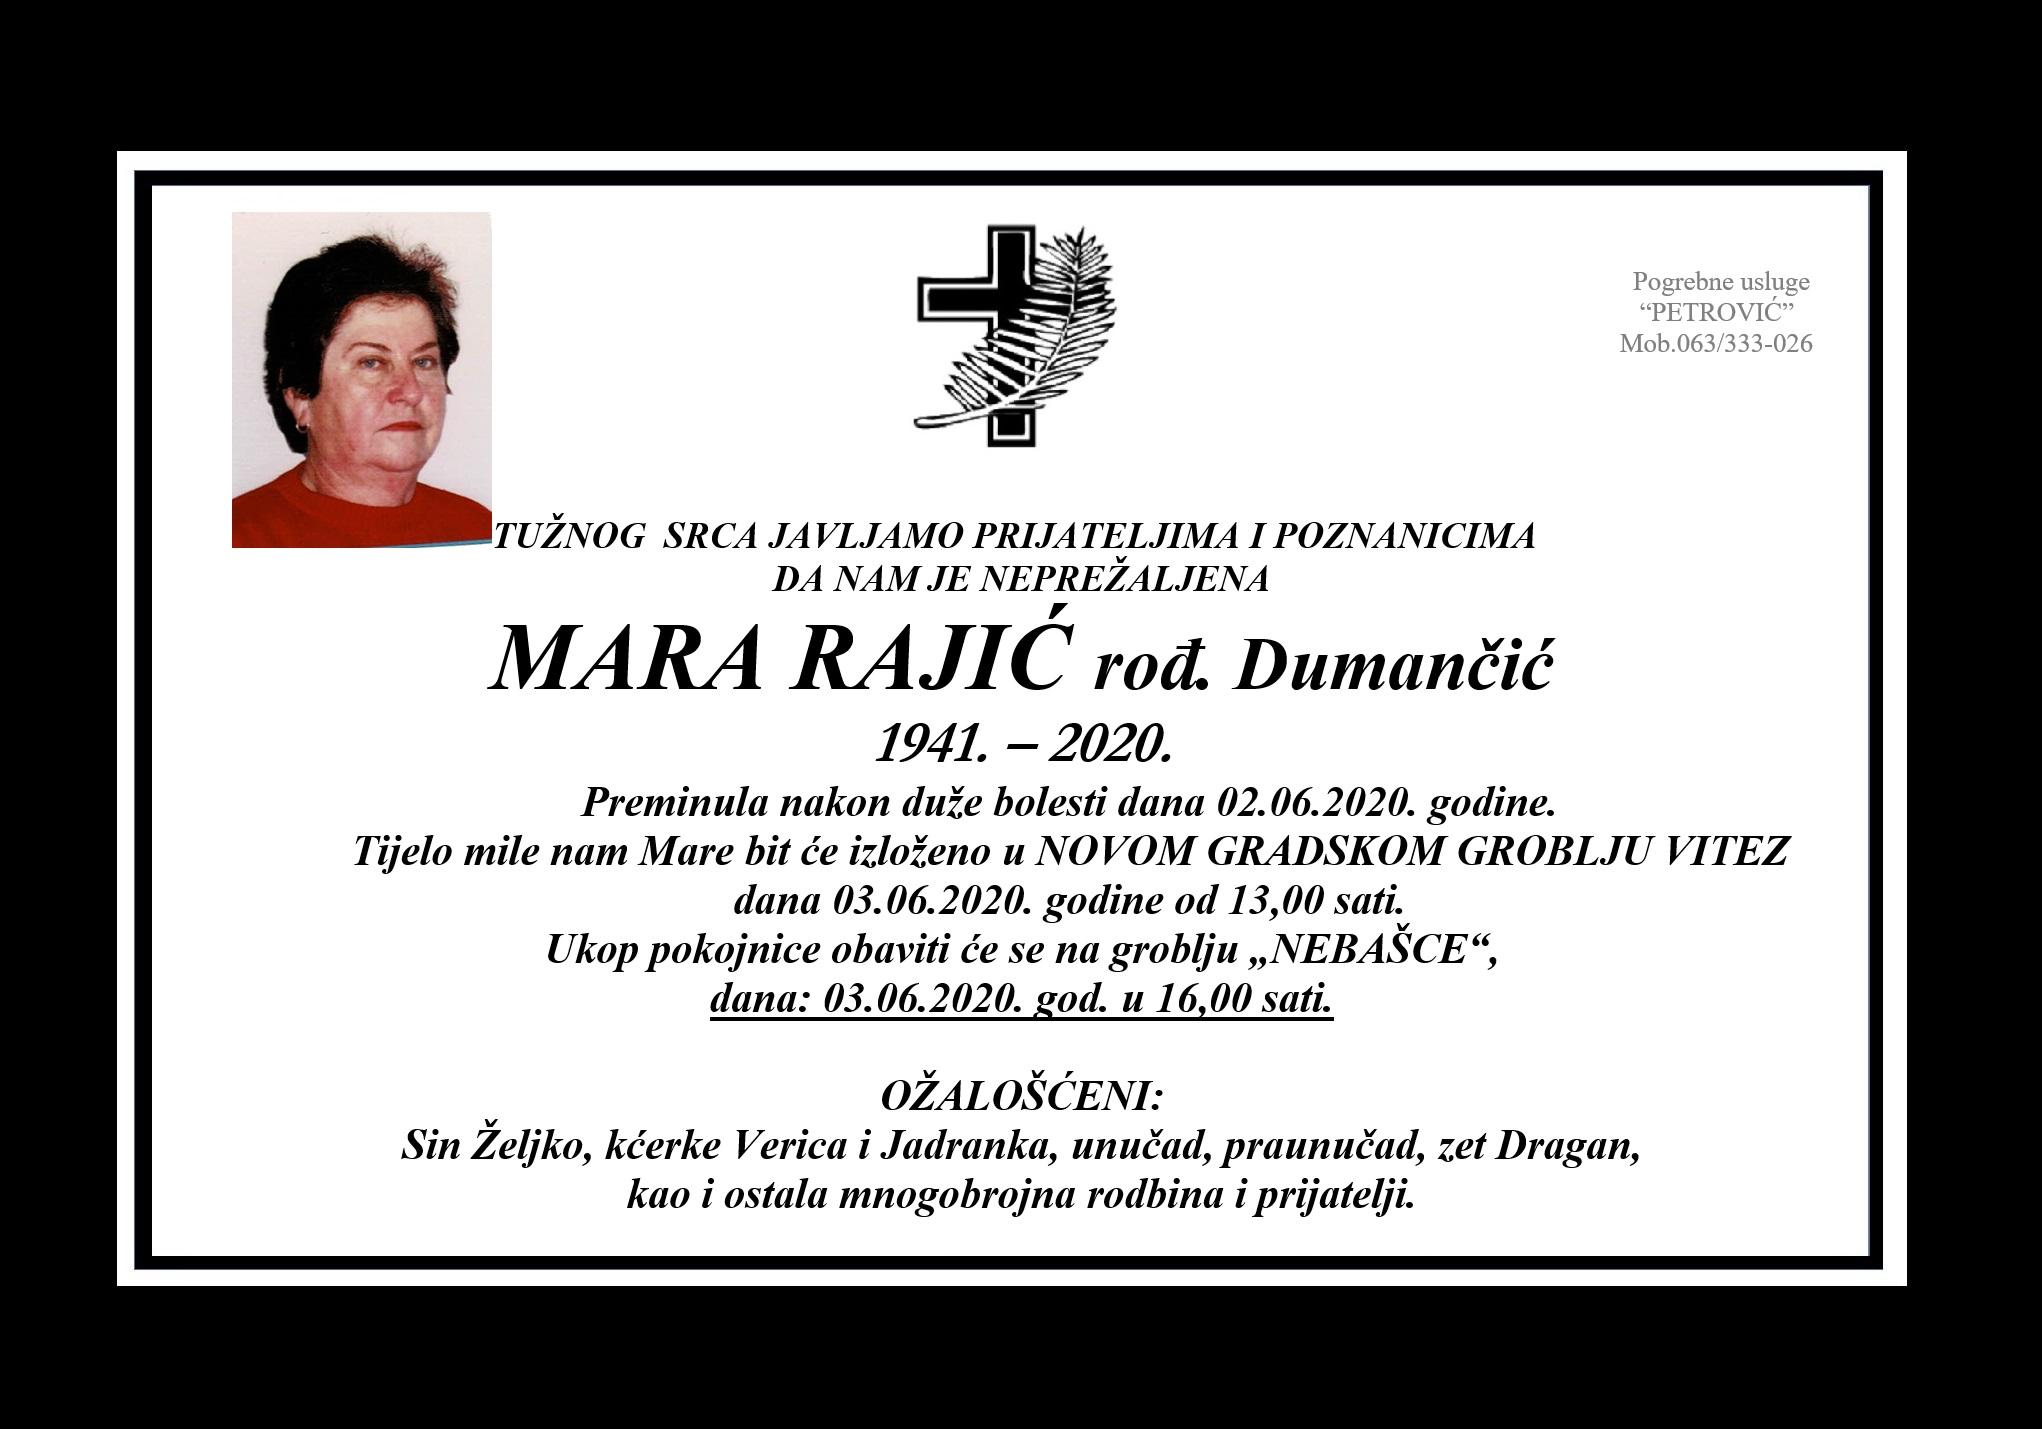 Mara Rajić rođ. Dumančić